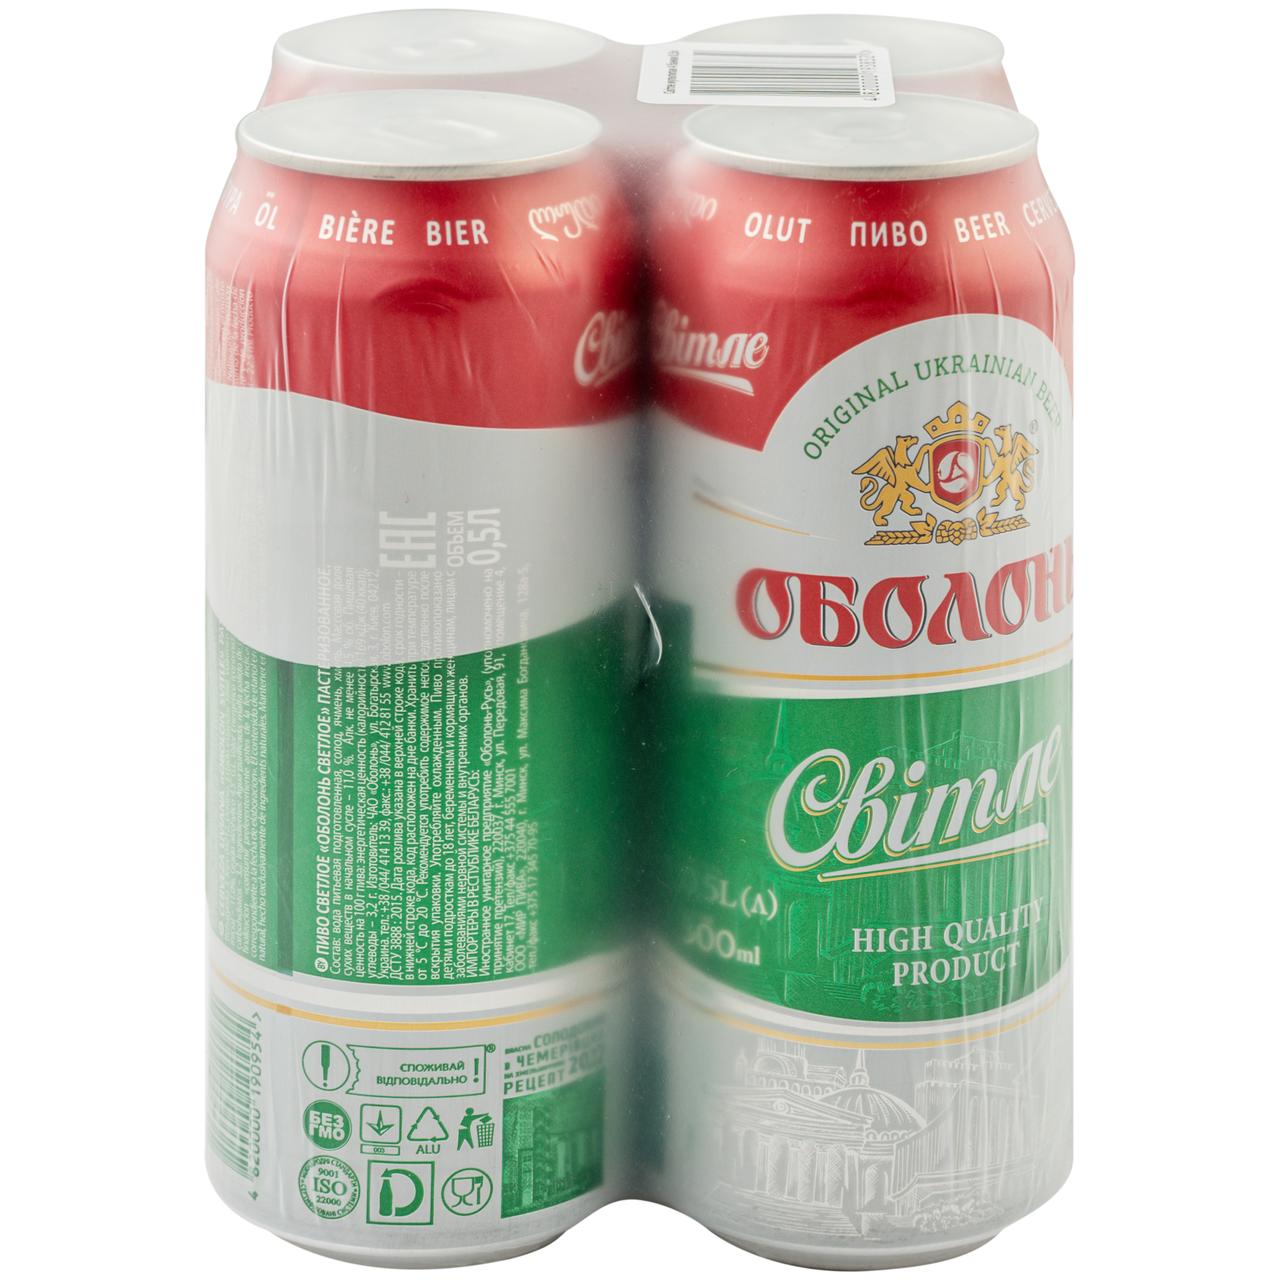 Пиво Оболонь світле пастеризоване 4.5% 0.5л